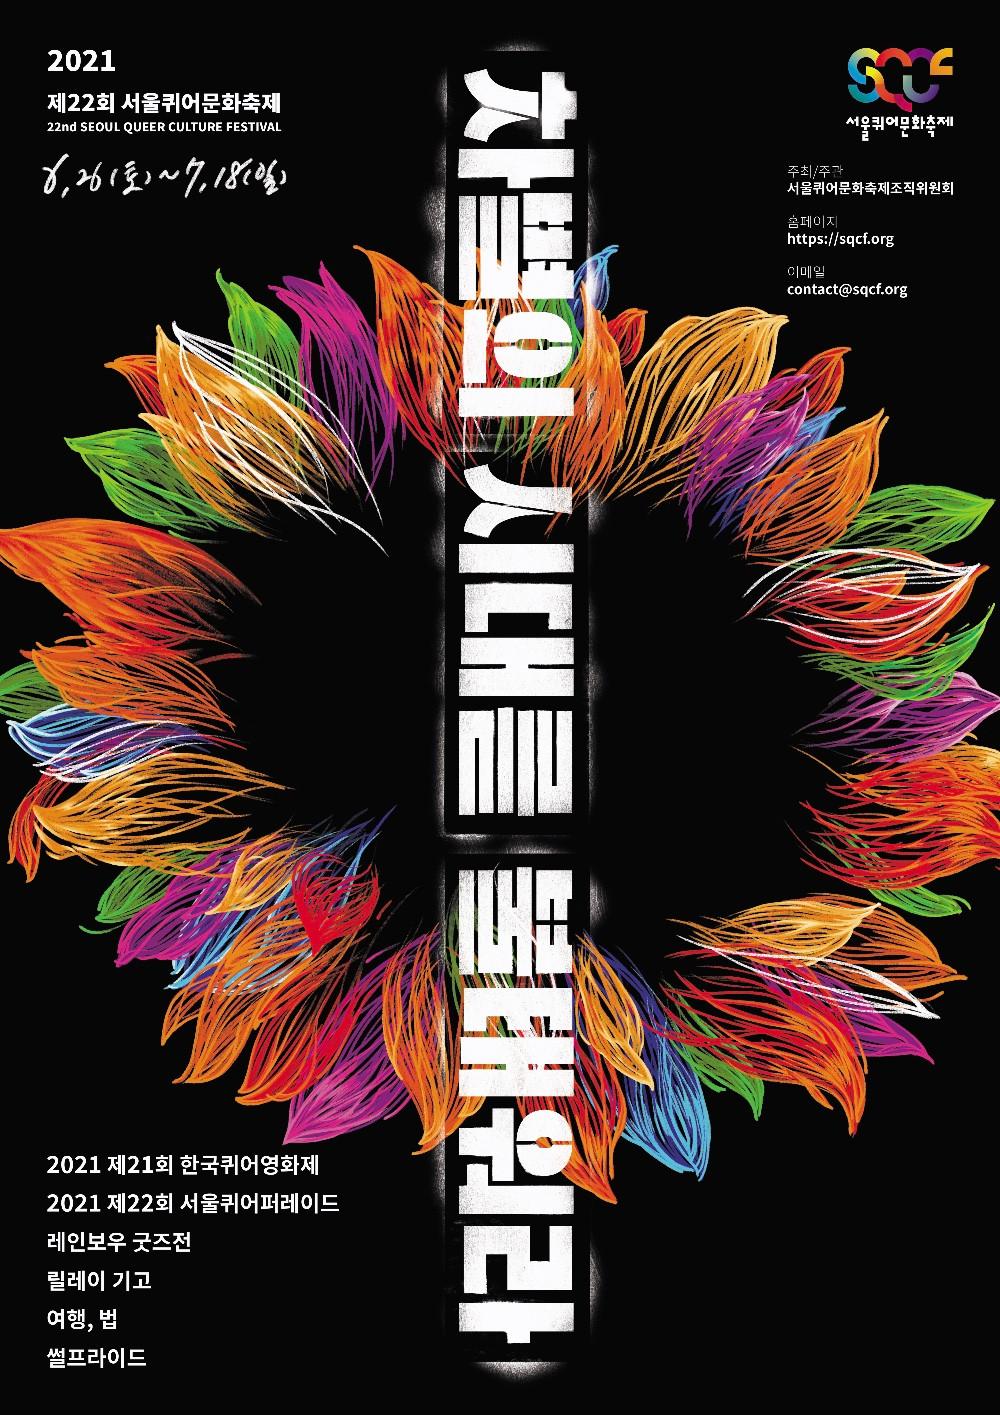 korea seoul pride parade queer culture festival lgbt lgbtq heezy yang 서울 퀴어 문화 축제 퍼레이드